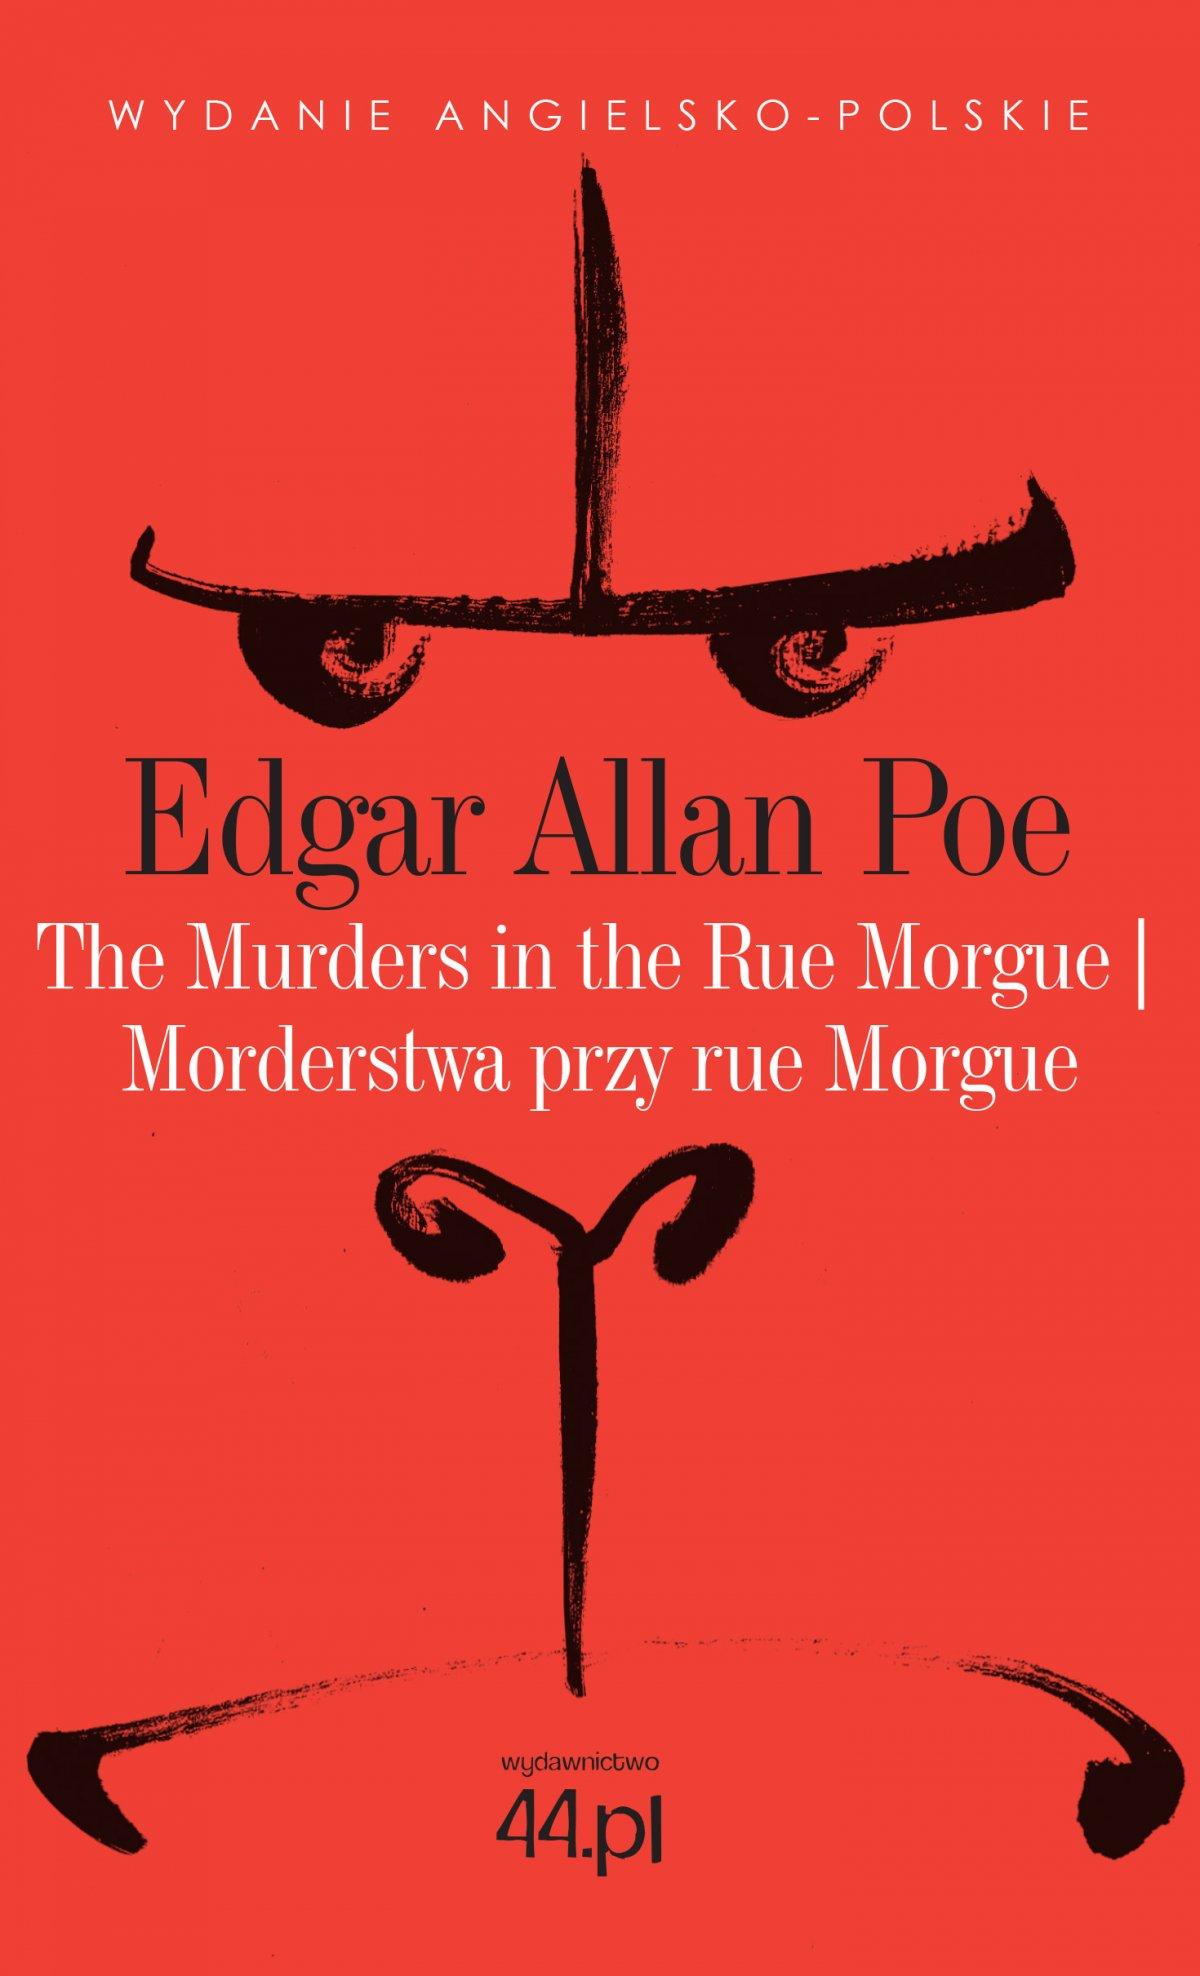 The Murders in the Rue Morgue. Morderstwa przy rue Morgue - Ebook (Książka na Kindle) do pobrania w formacie MOBI